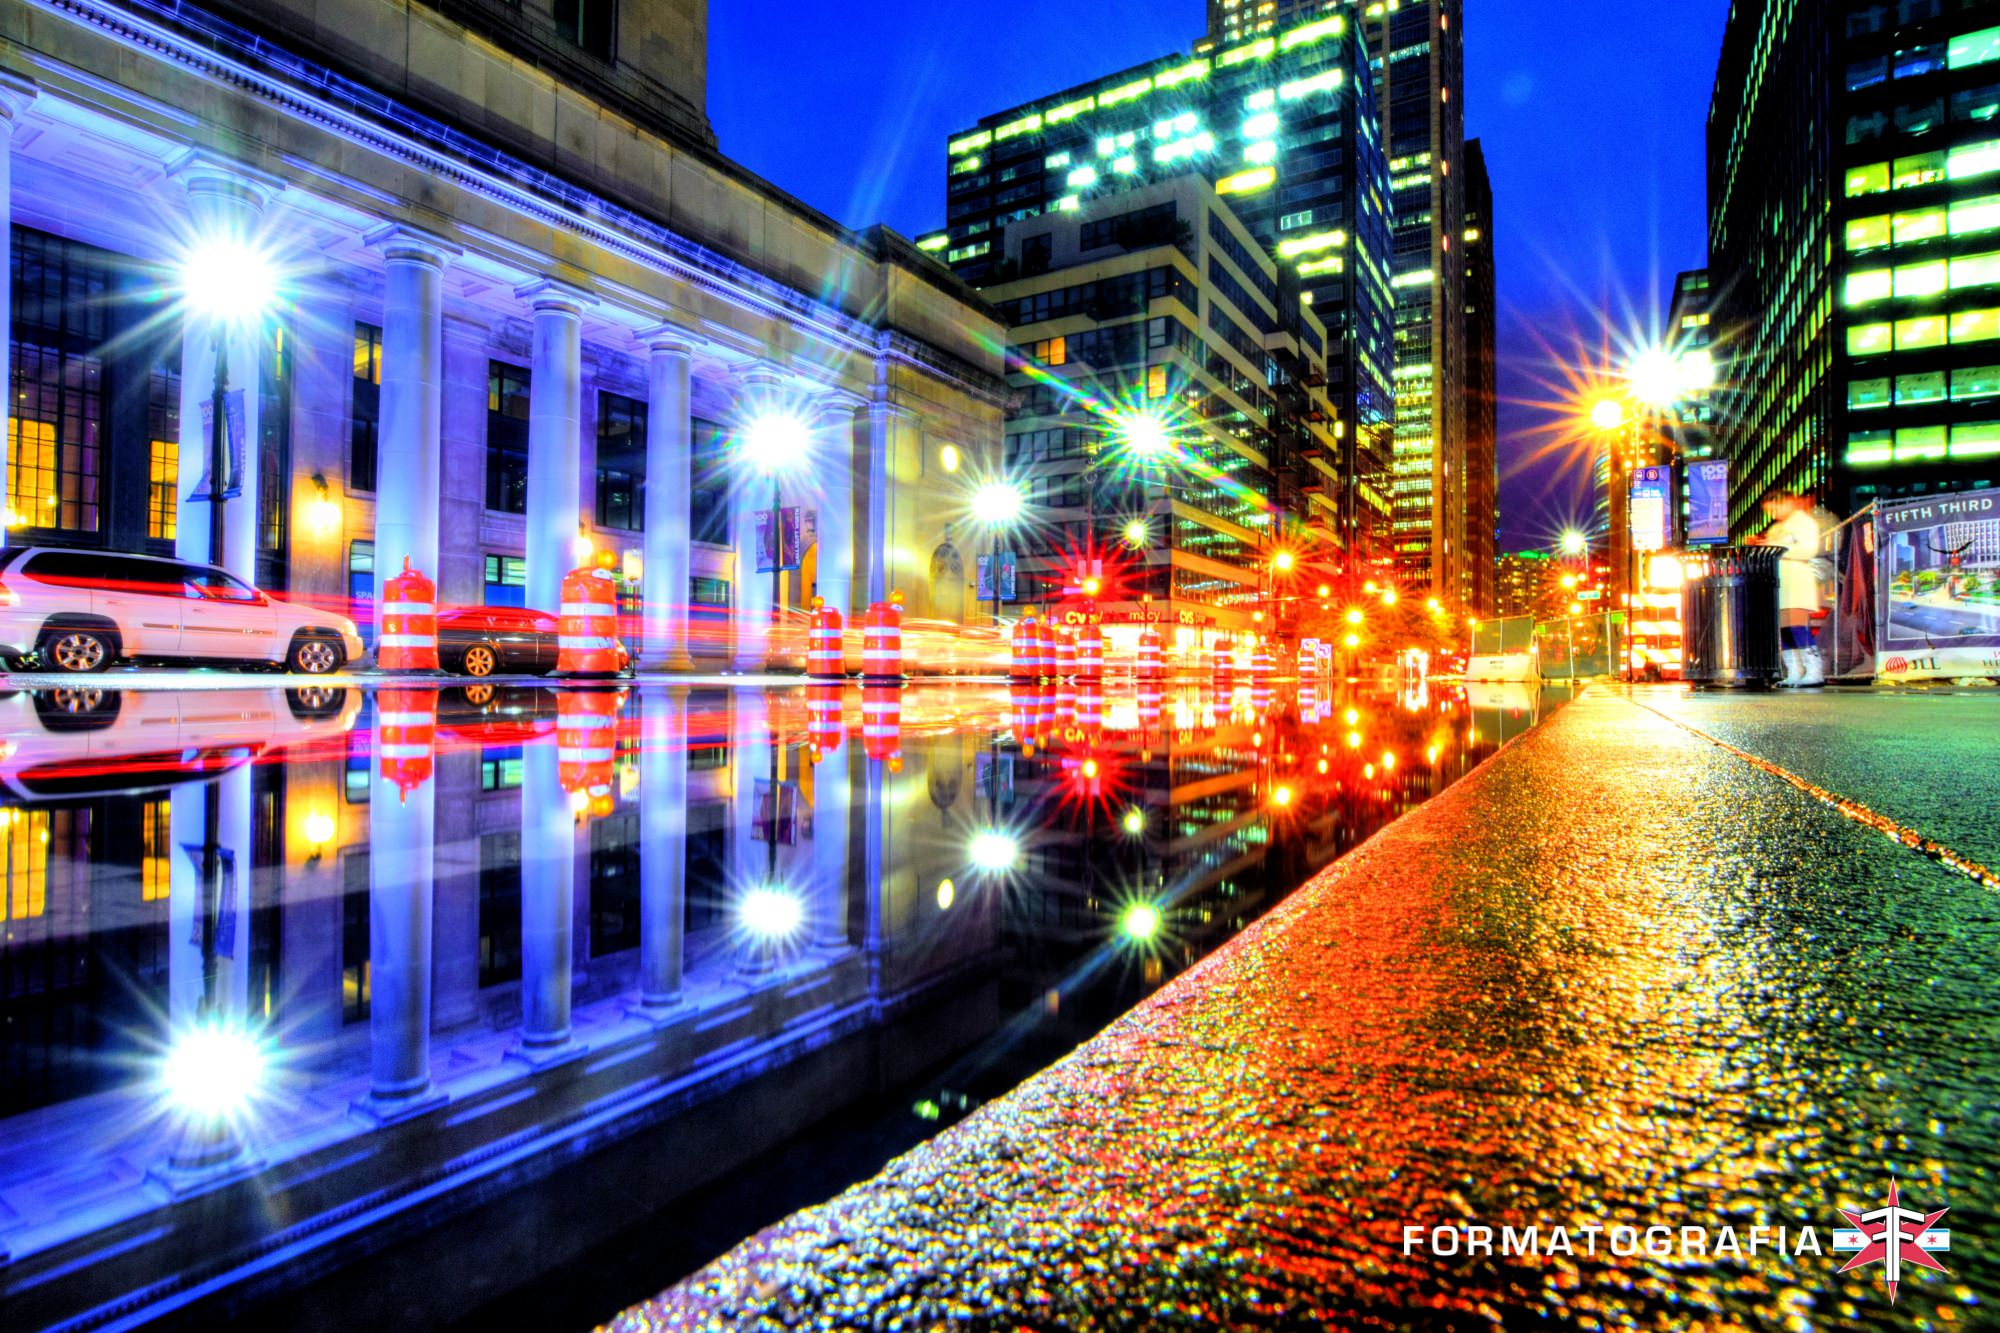 eric formato chicago photographer fall update city architecture shotsunion puddle 4 color pop.jpg